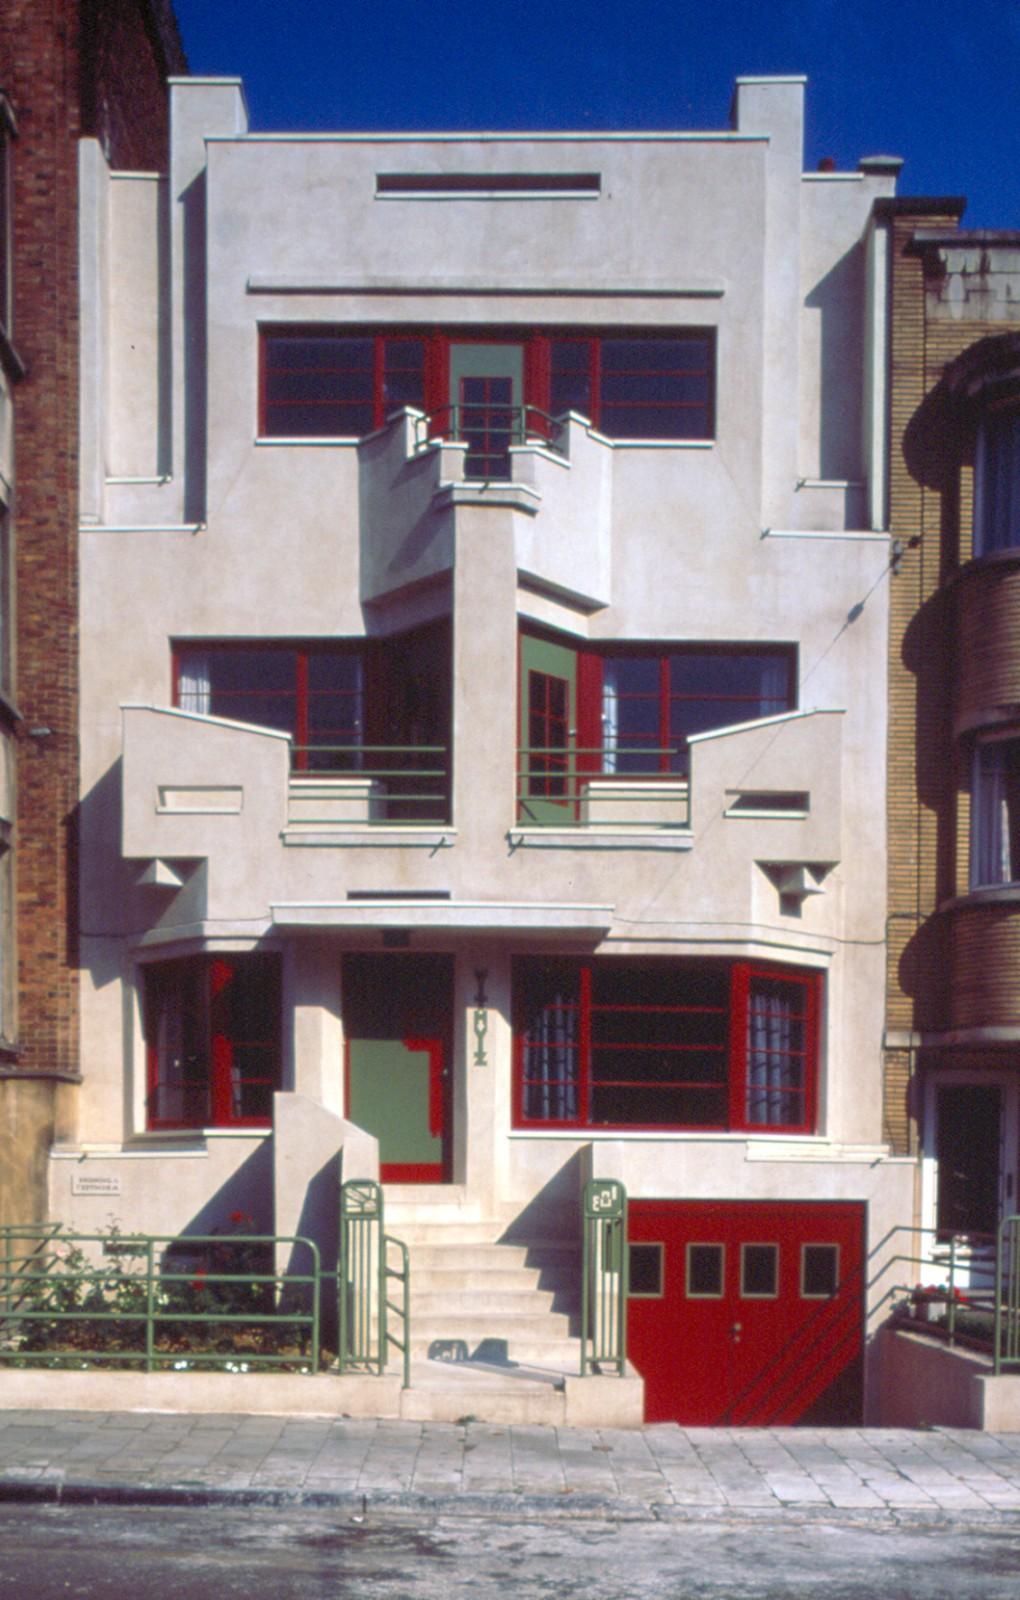 Art d co withuis av charles woeste 183 jette 1927 architecte joseph diongre - Deco huizen ...